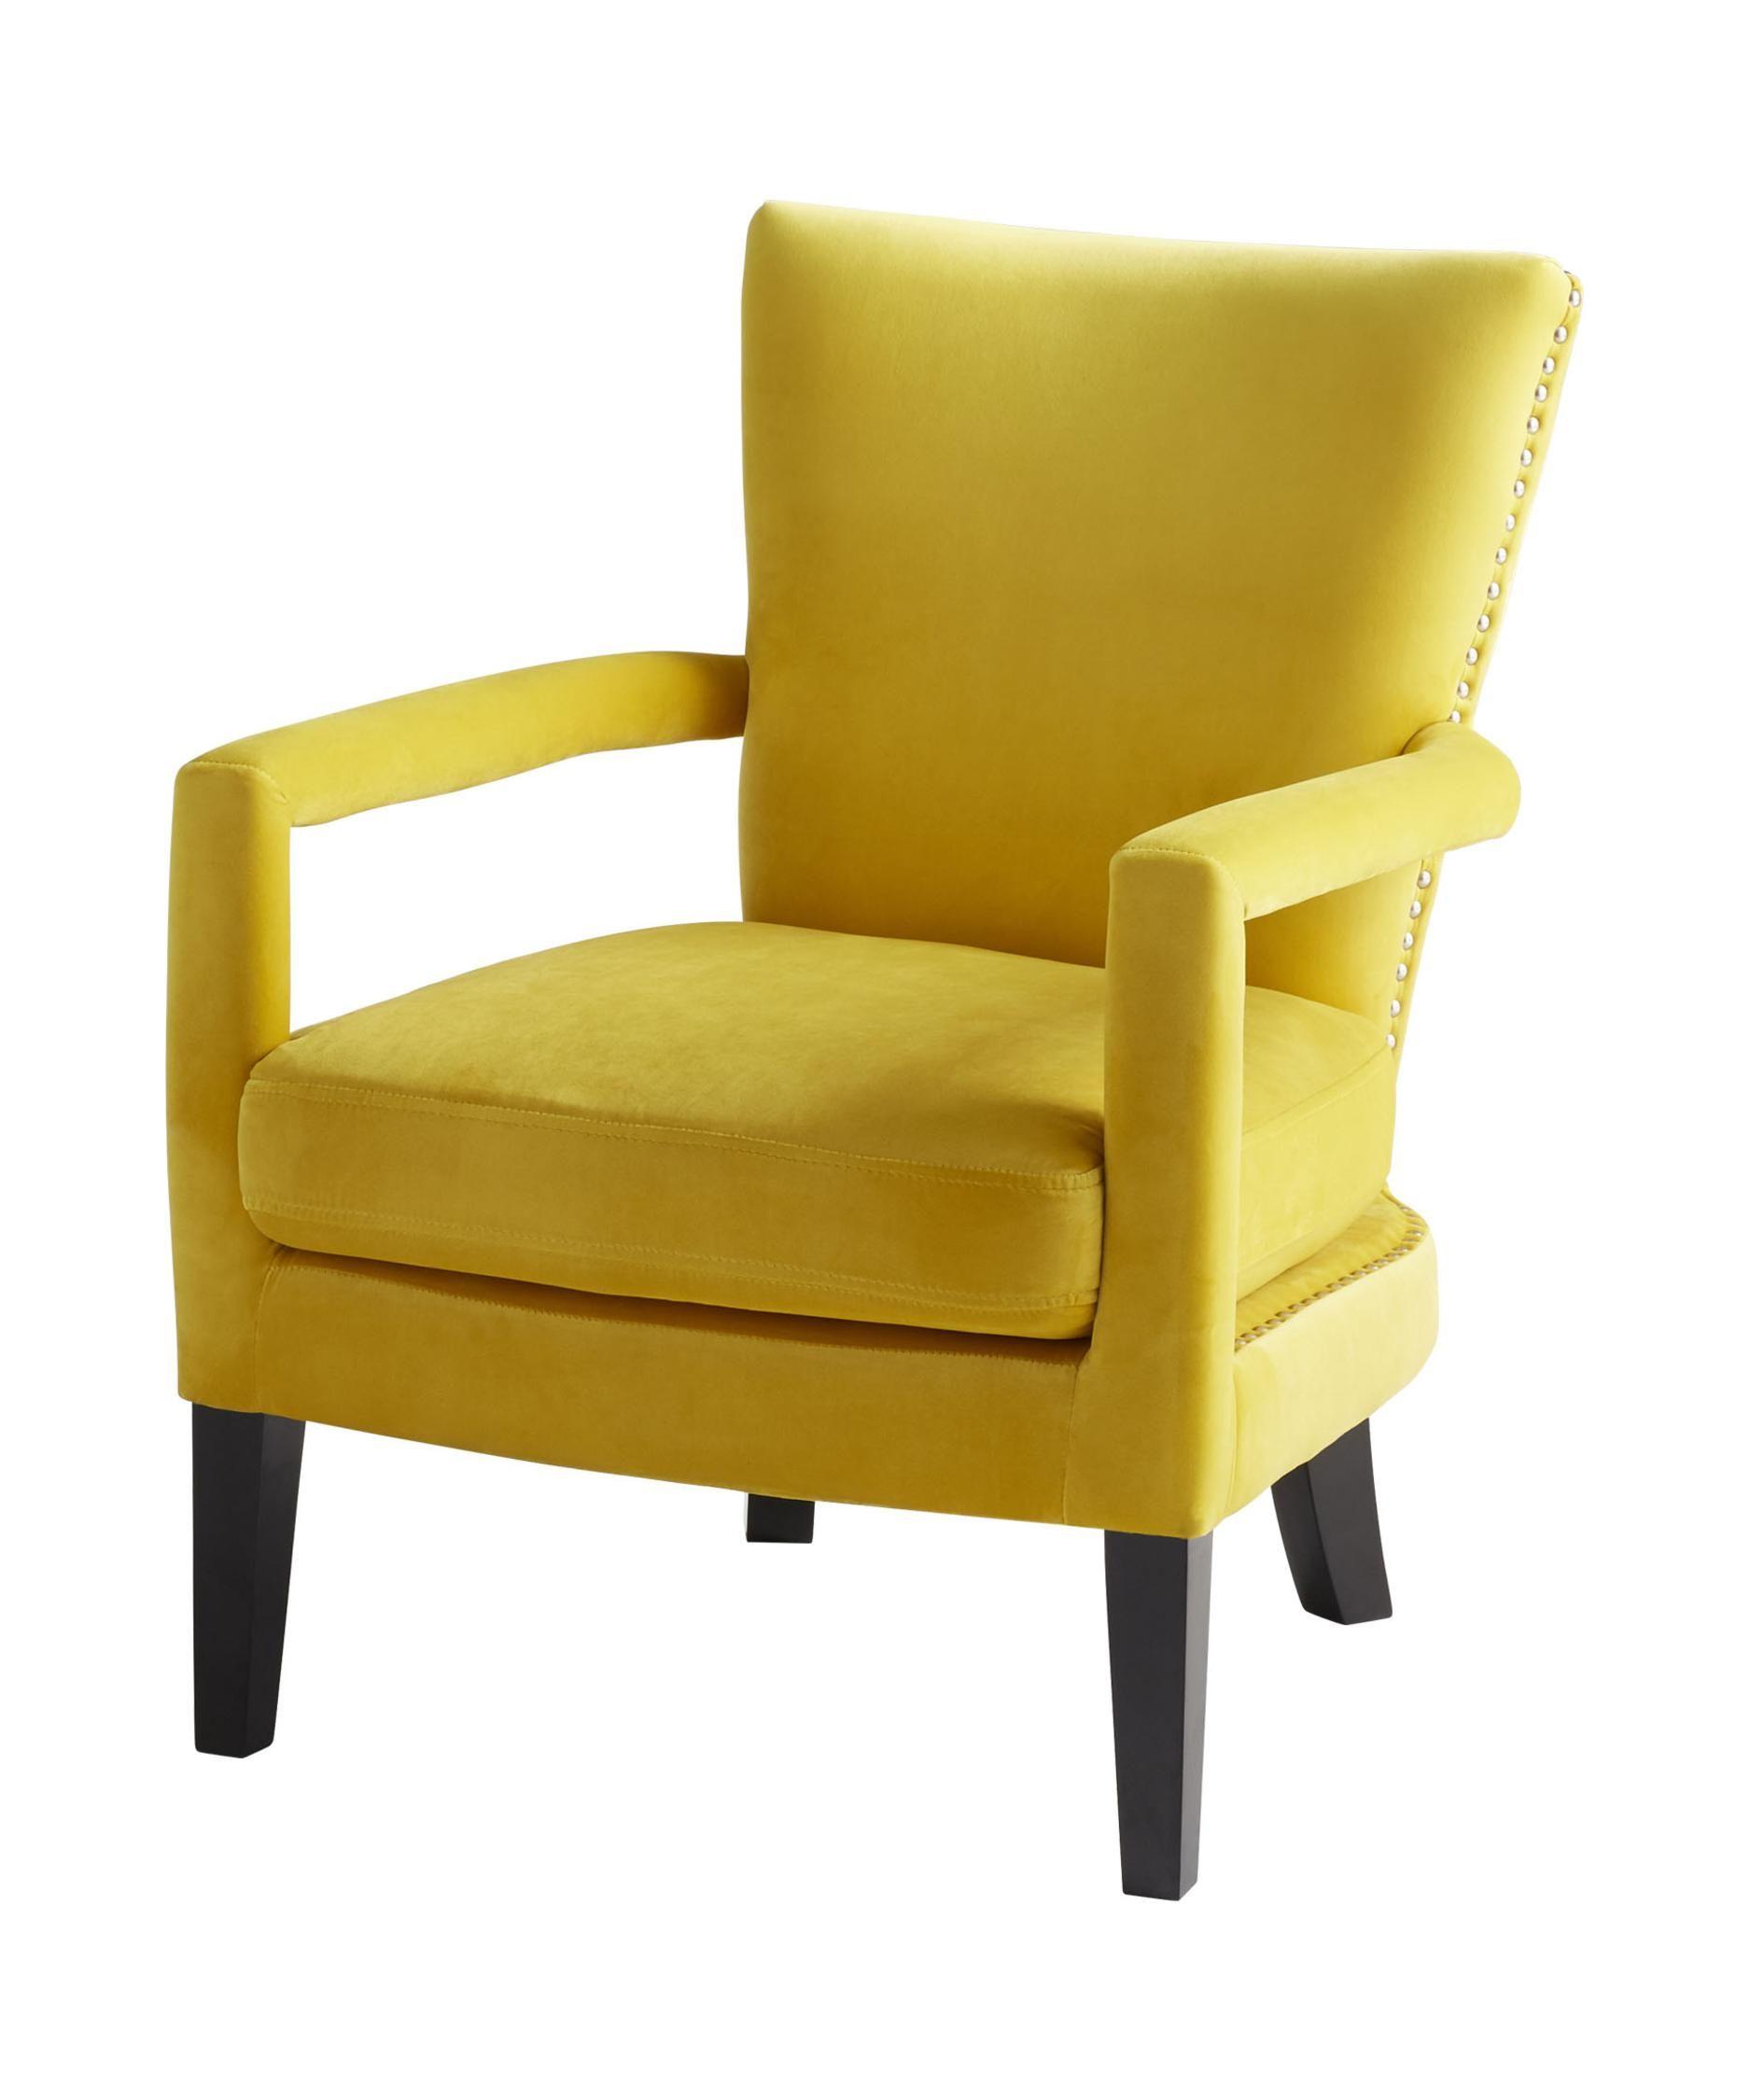 Cyan Design Colonel Mustard Arm Chair | Capitol Lighting 1 800lighting.com